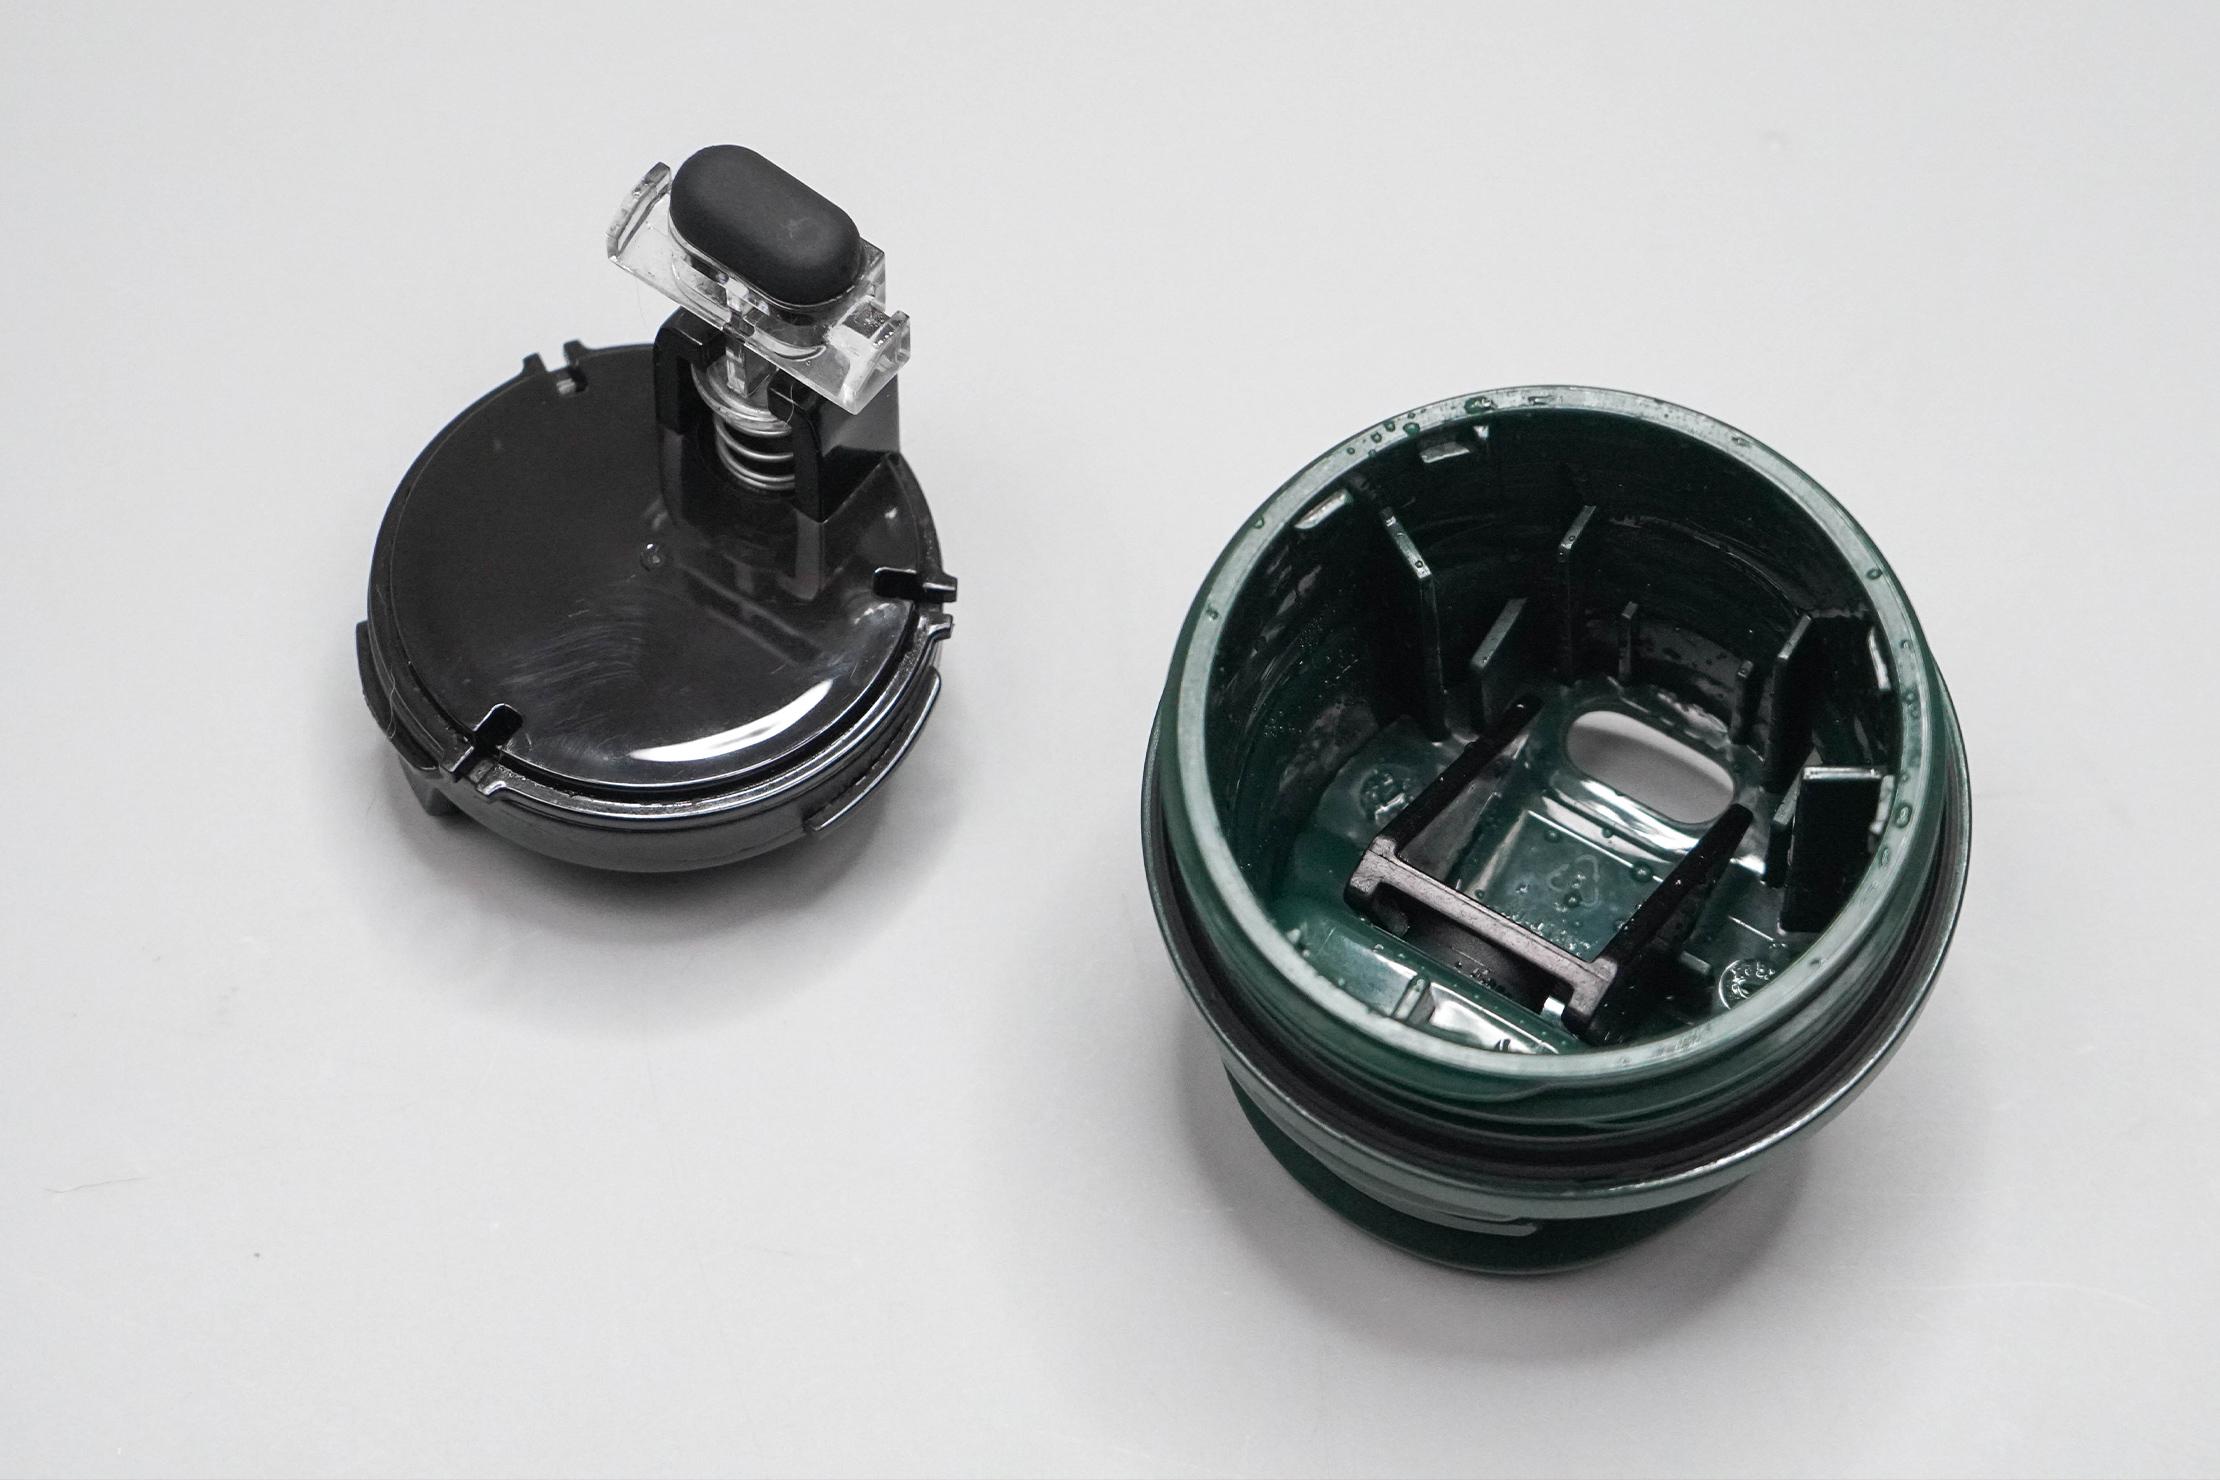 Stanley Classic Trigger-Action Travel Mug 12oz Cap Apart